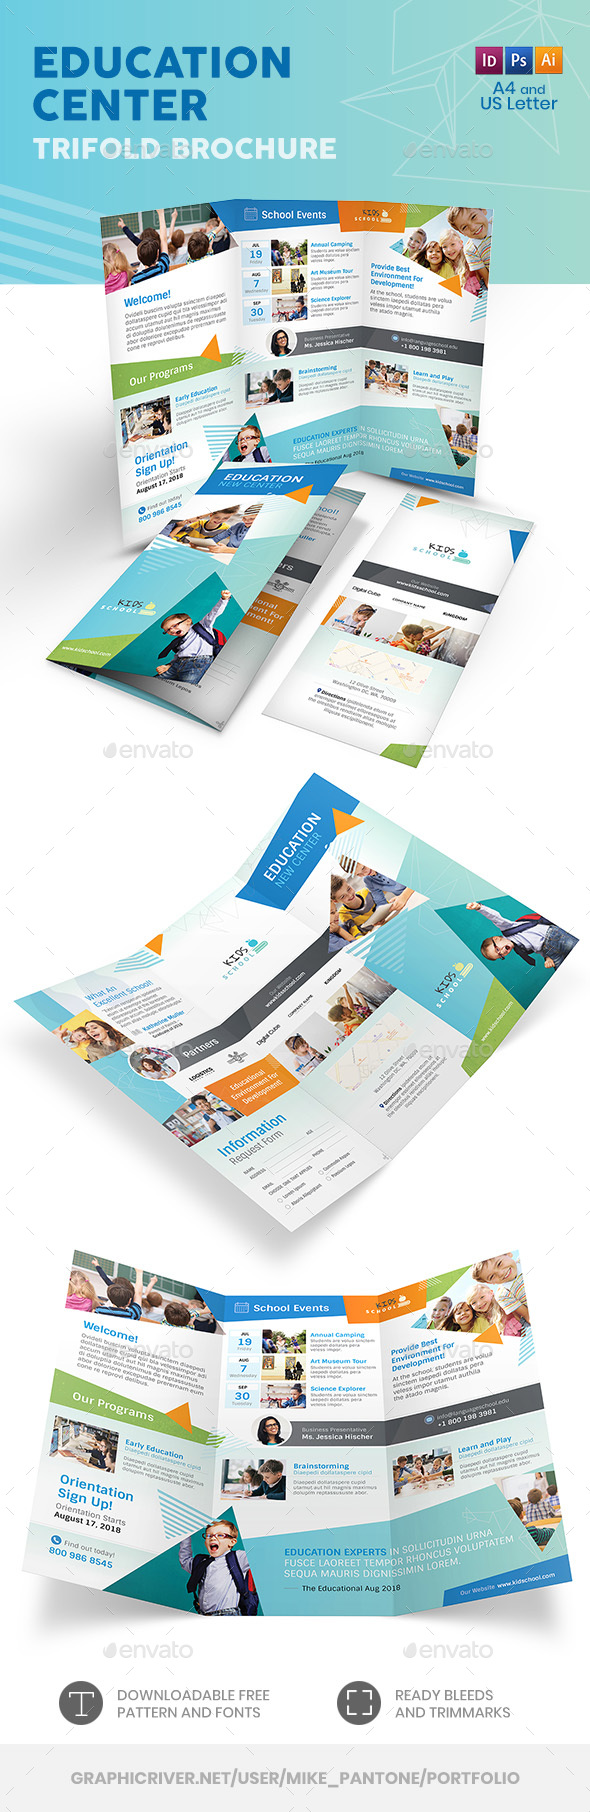 Education Trifold Brochure 11 - Informational Brochures